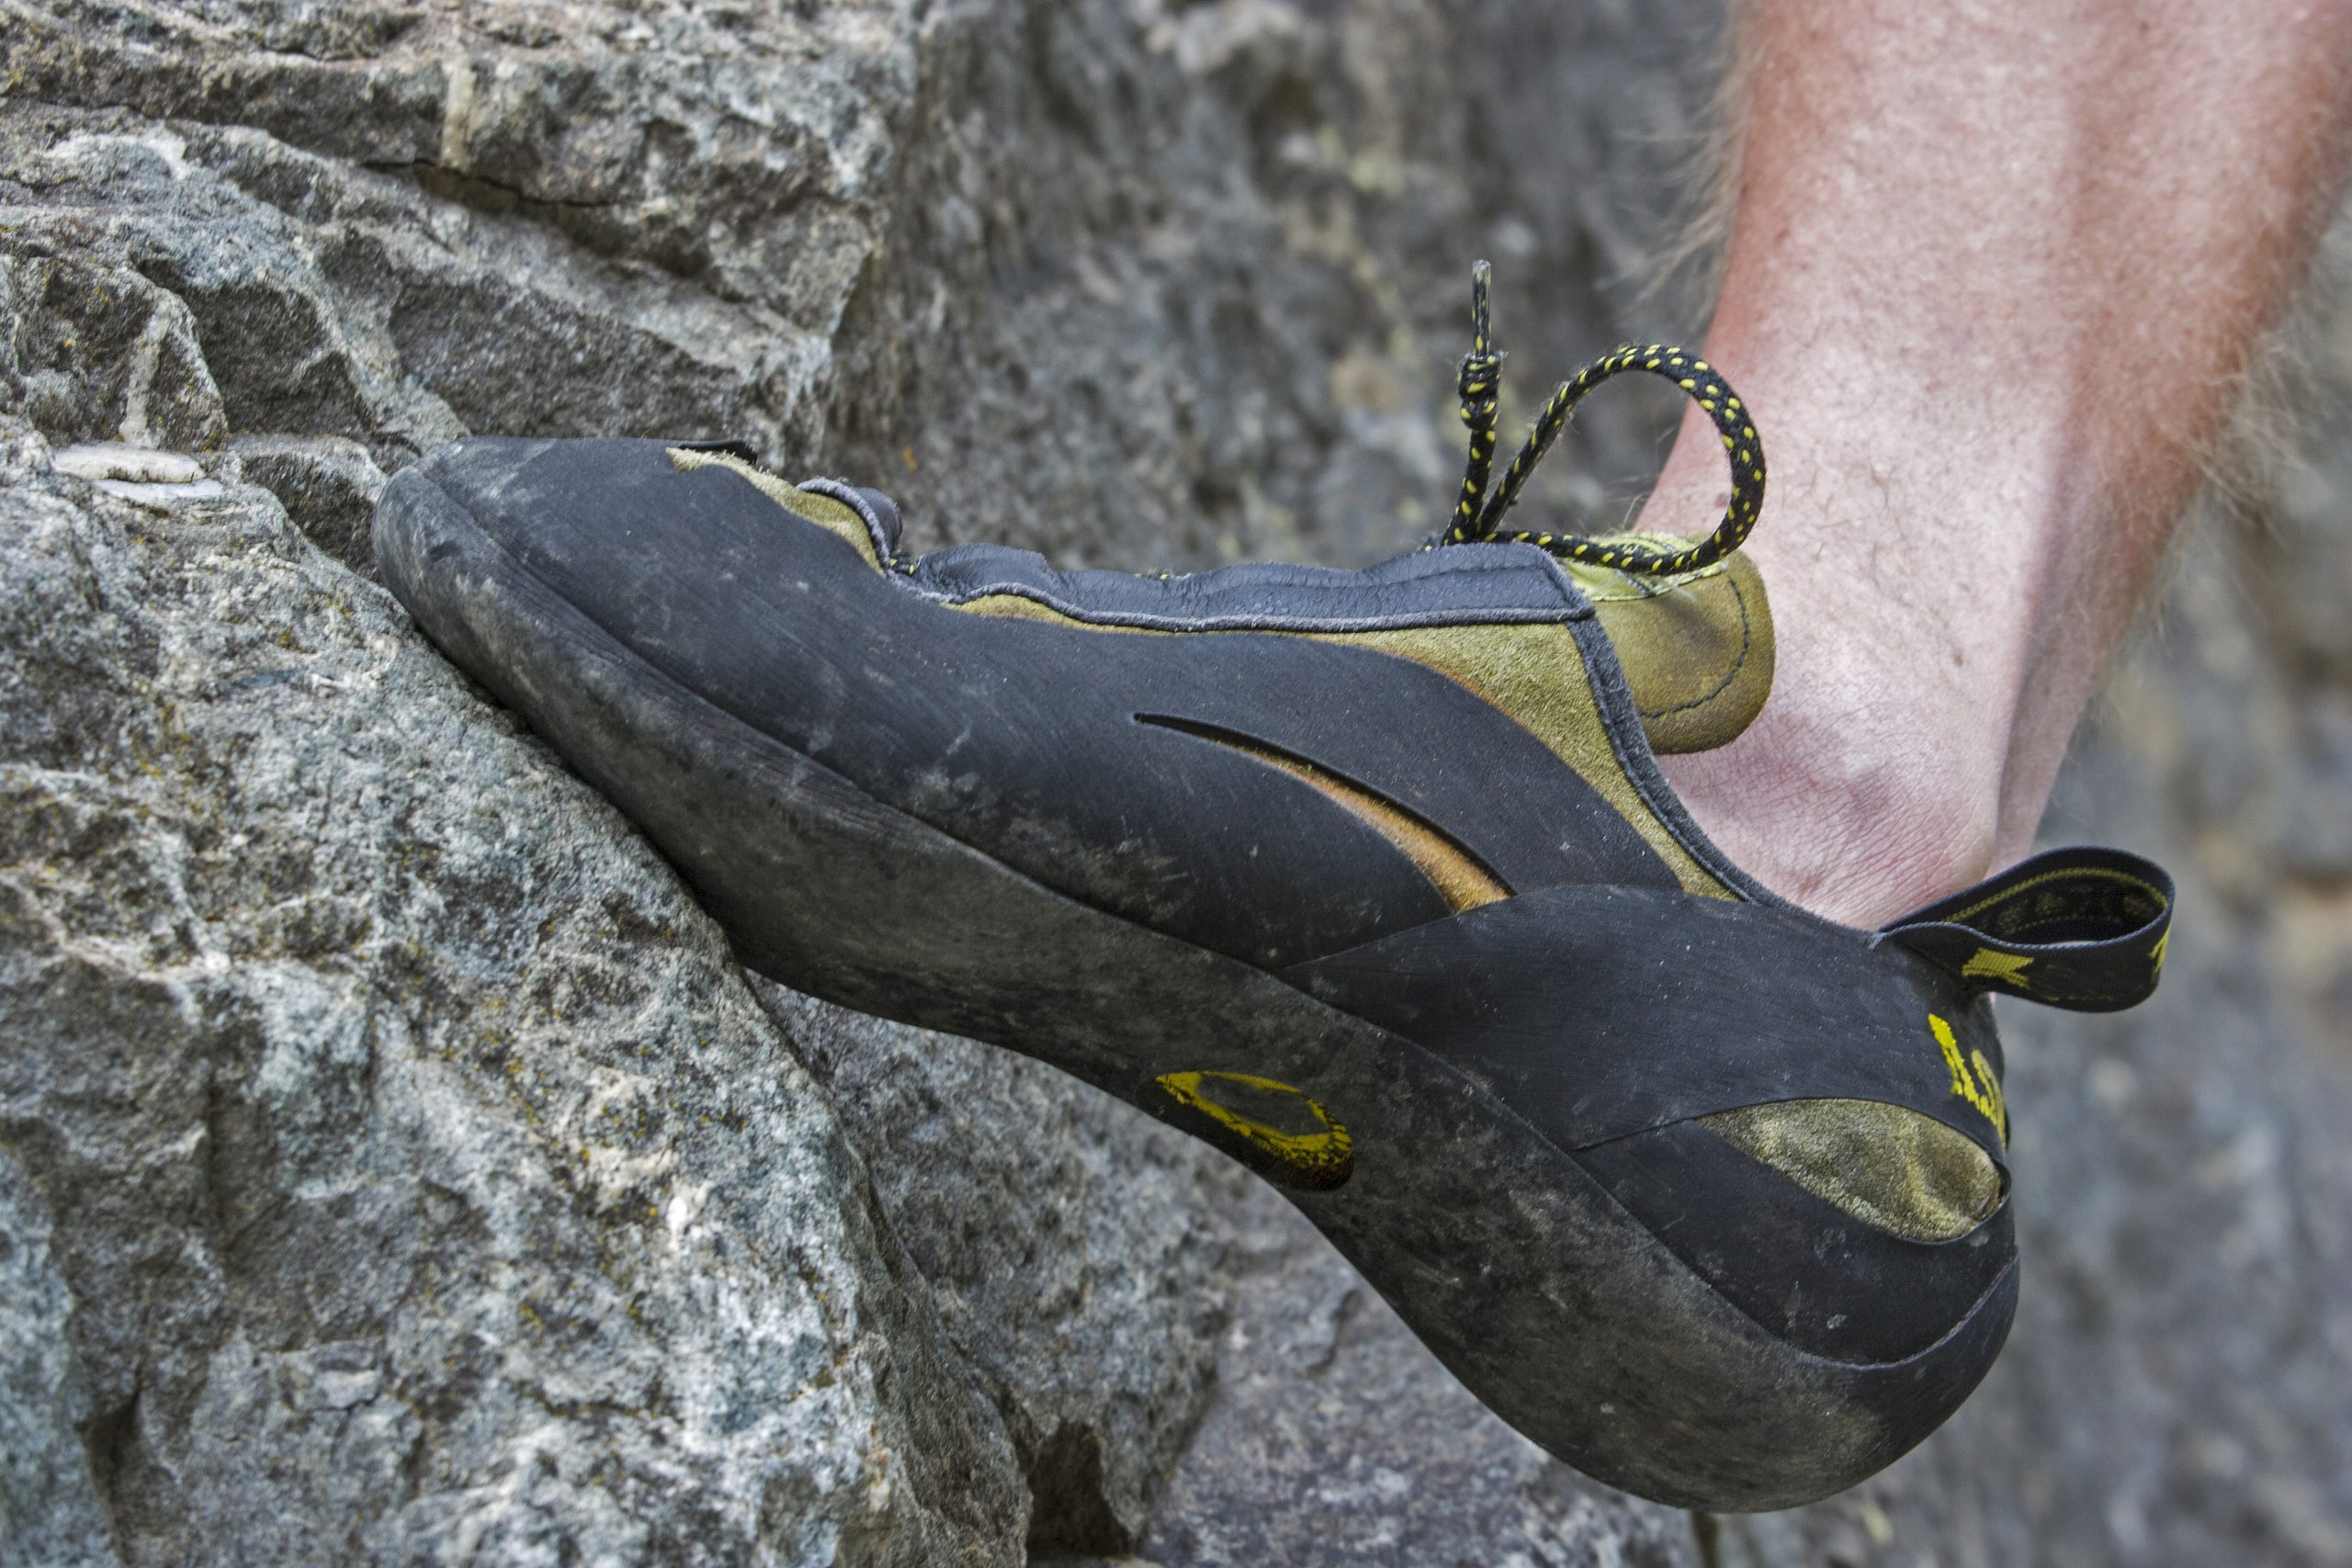 Rock climbing at Boat Rock Bouldering Area